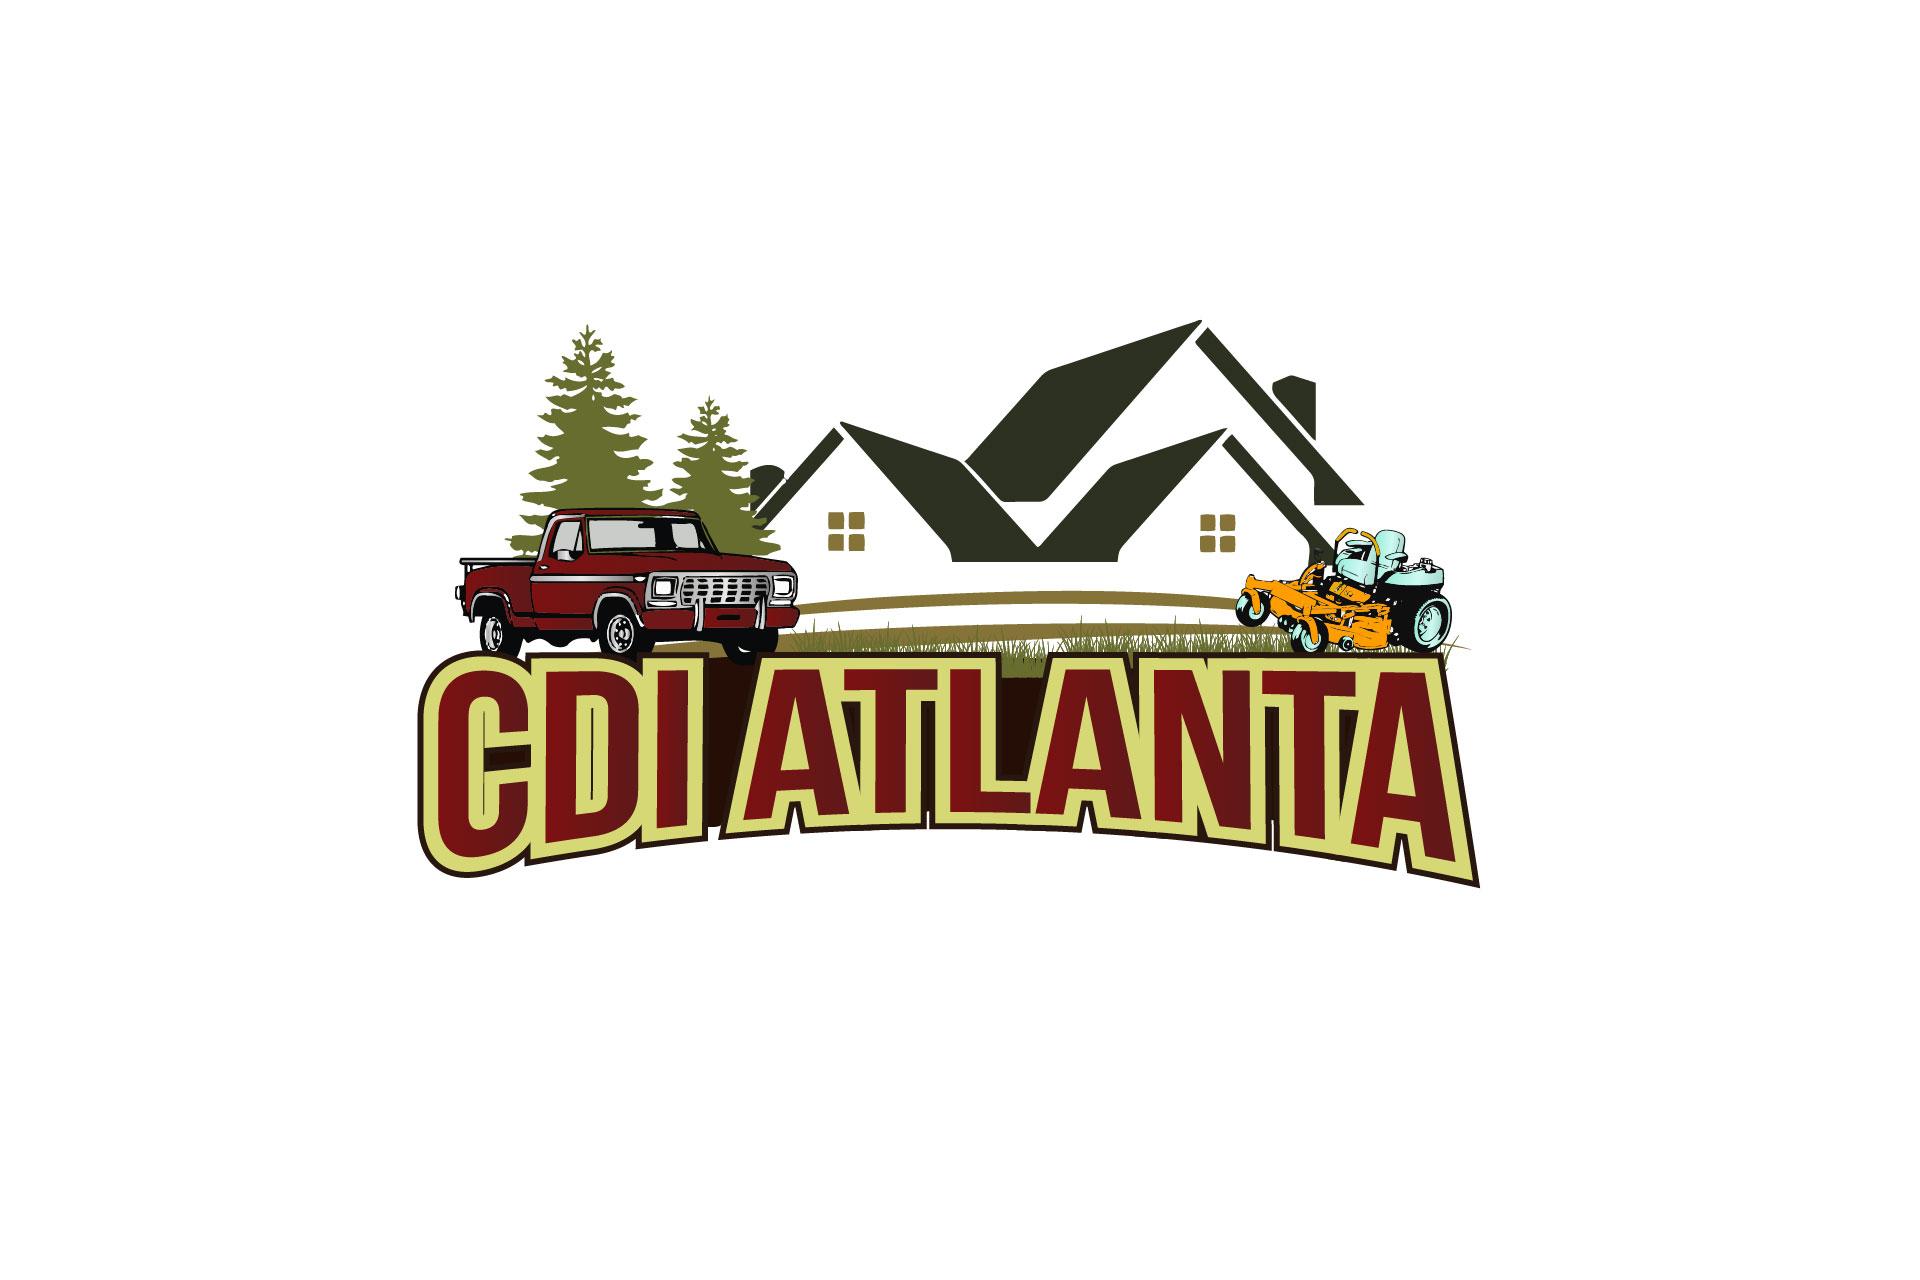 Cdiatlanta